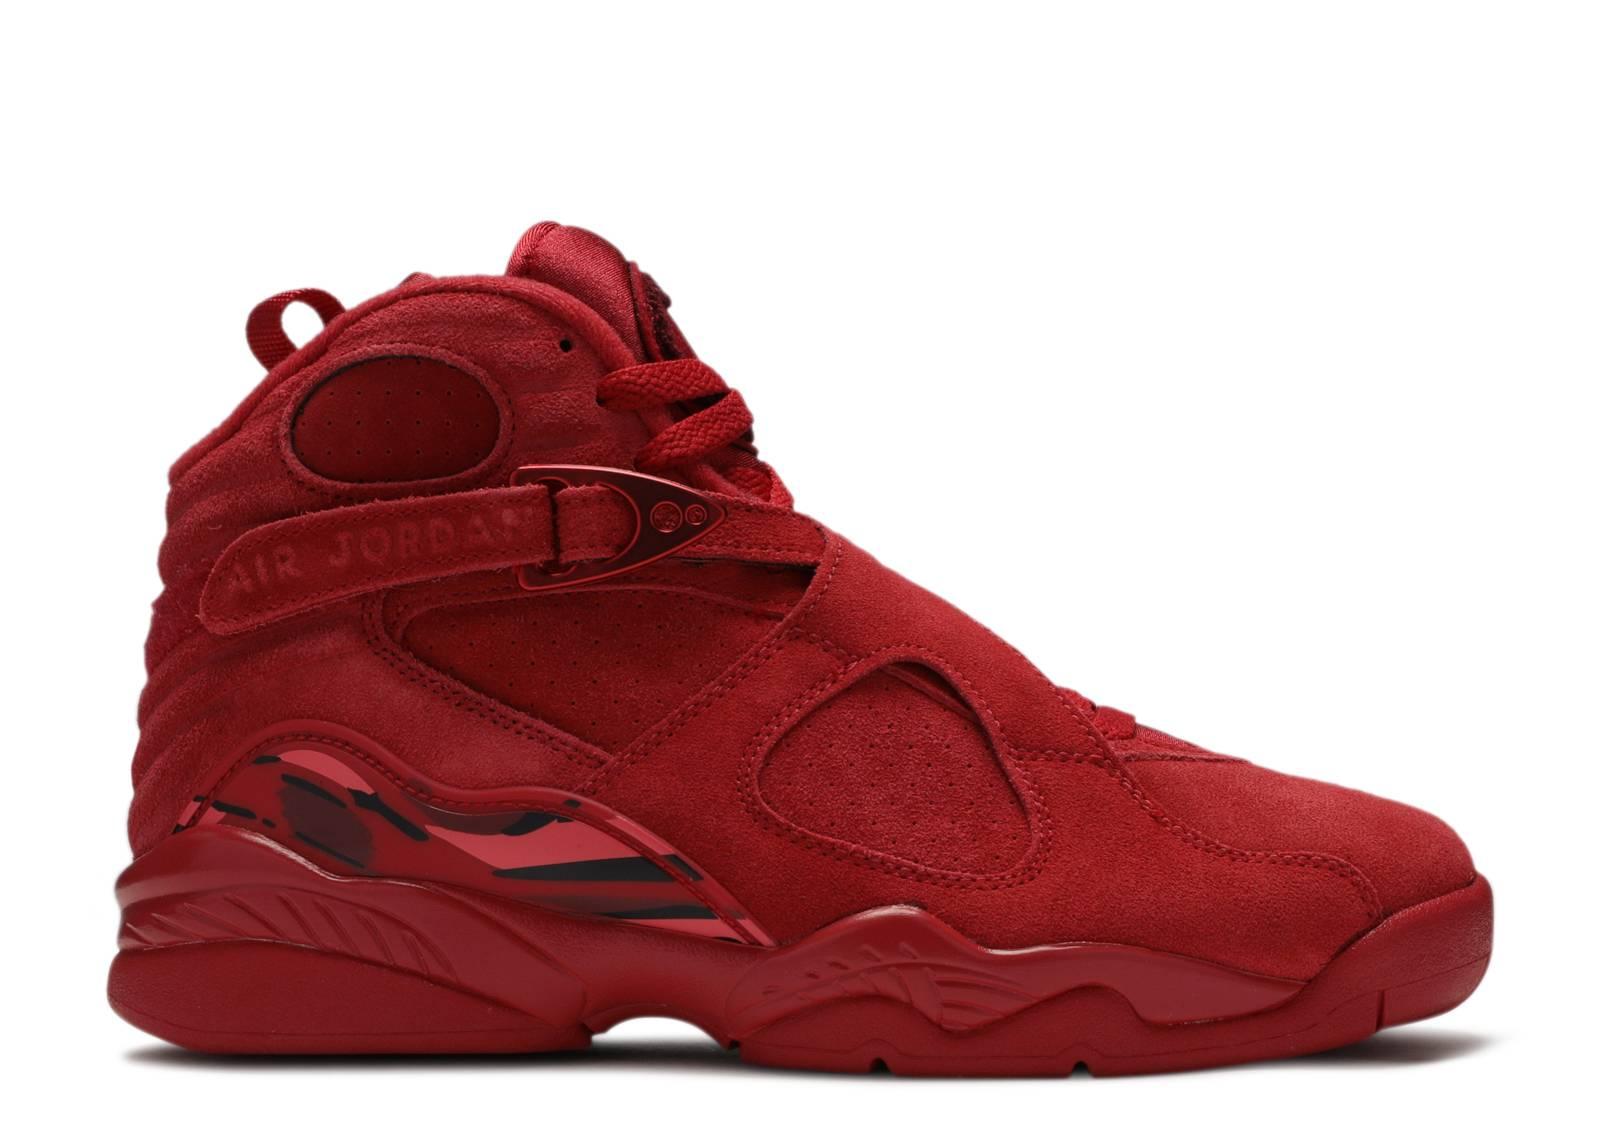 Wmns Air Jordan 8 Vday